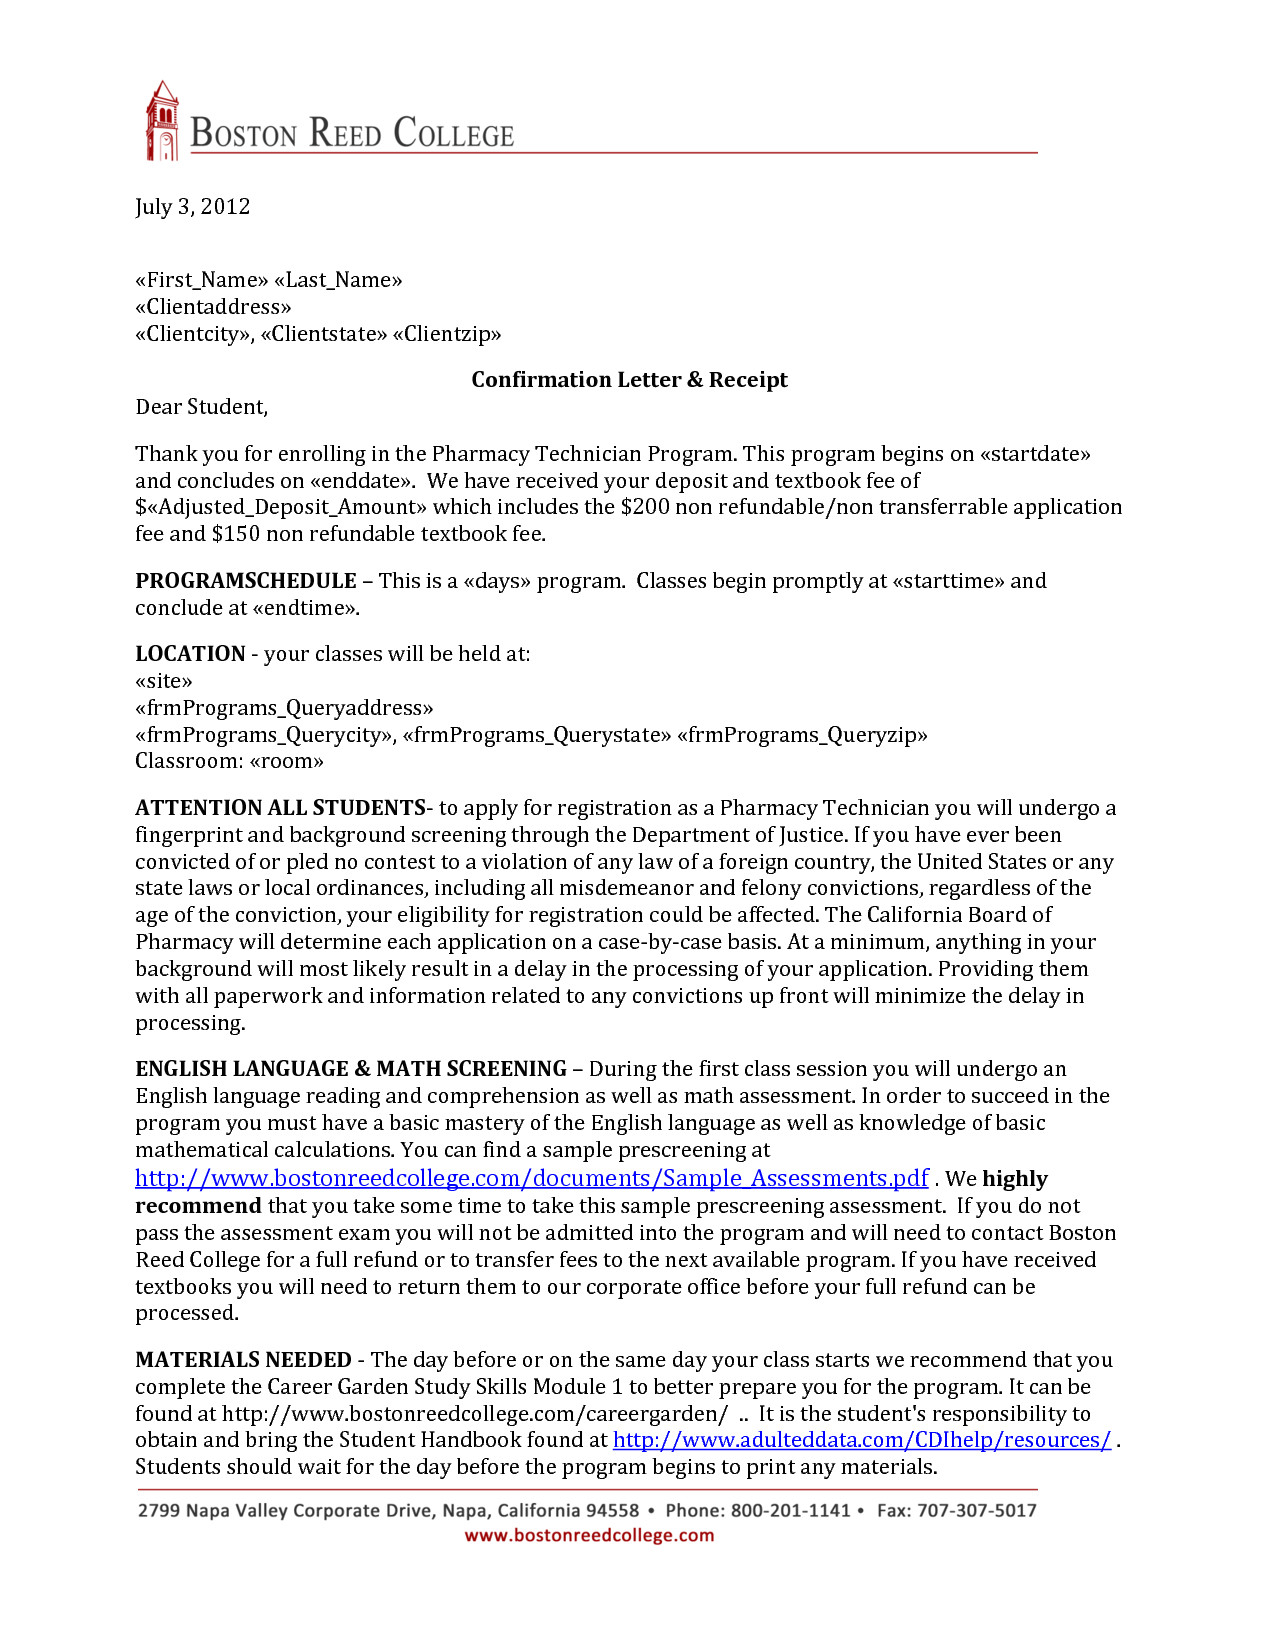 pharmacy technician letter format